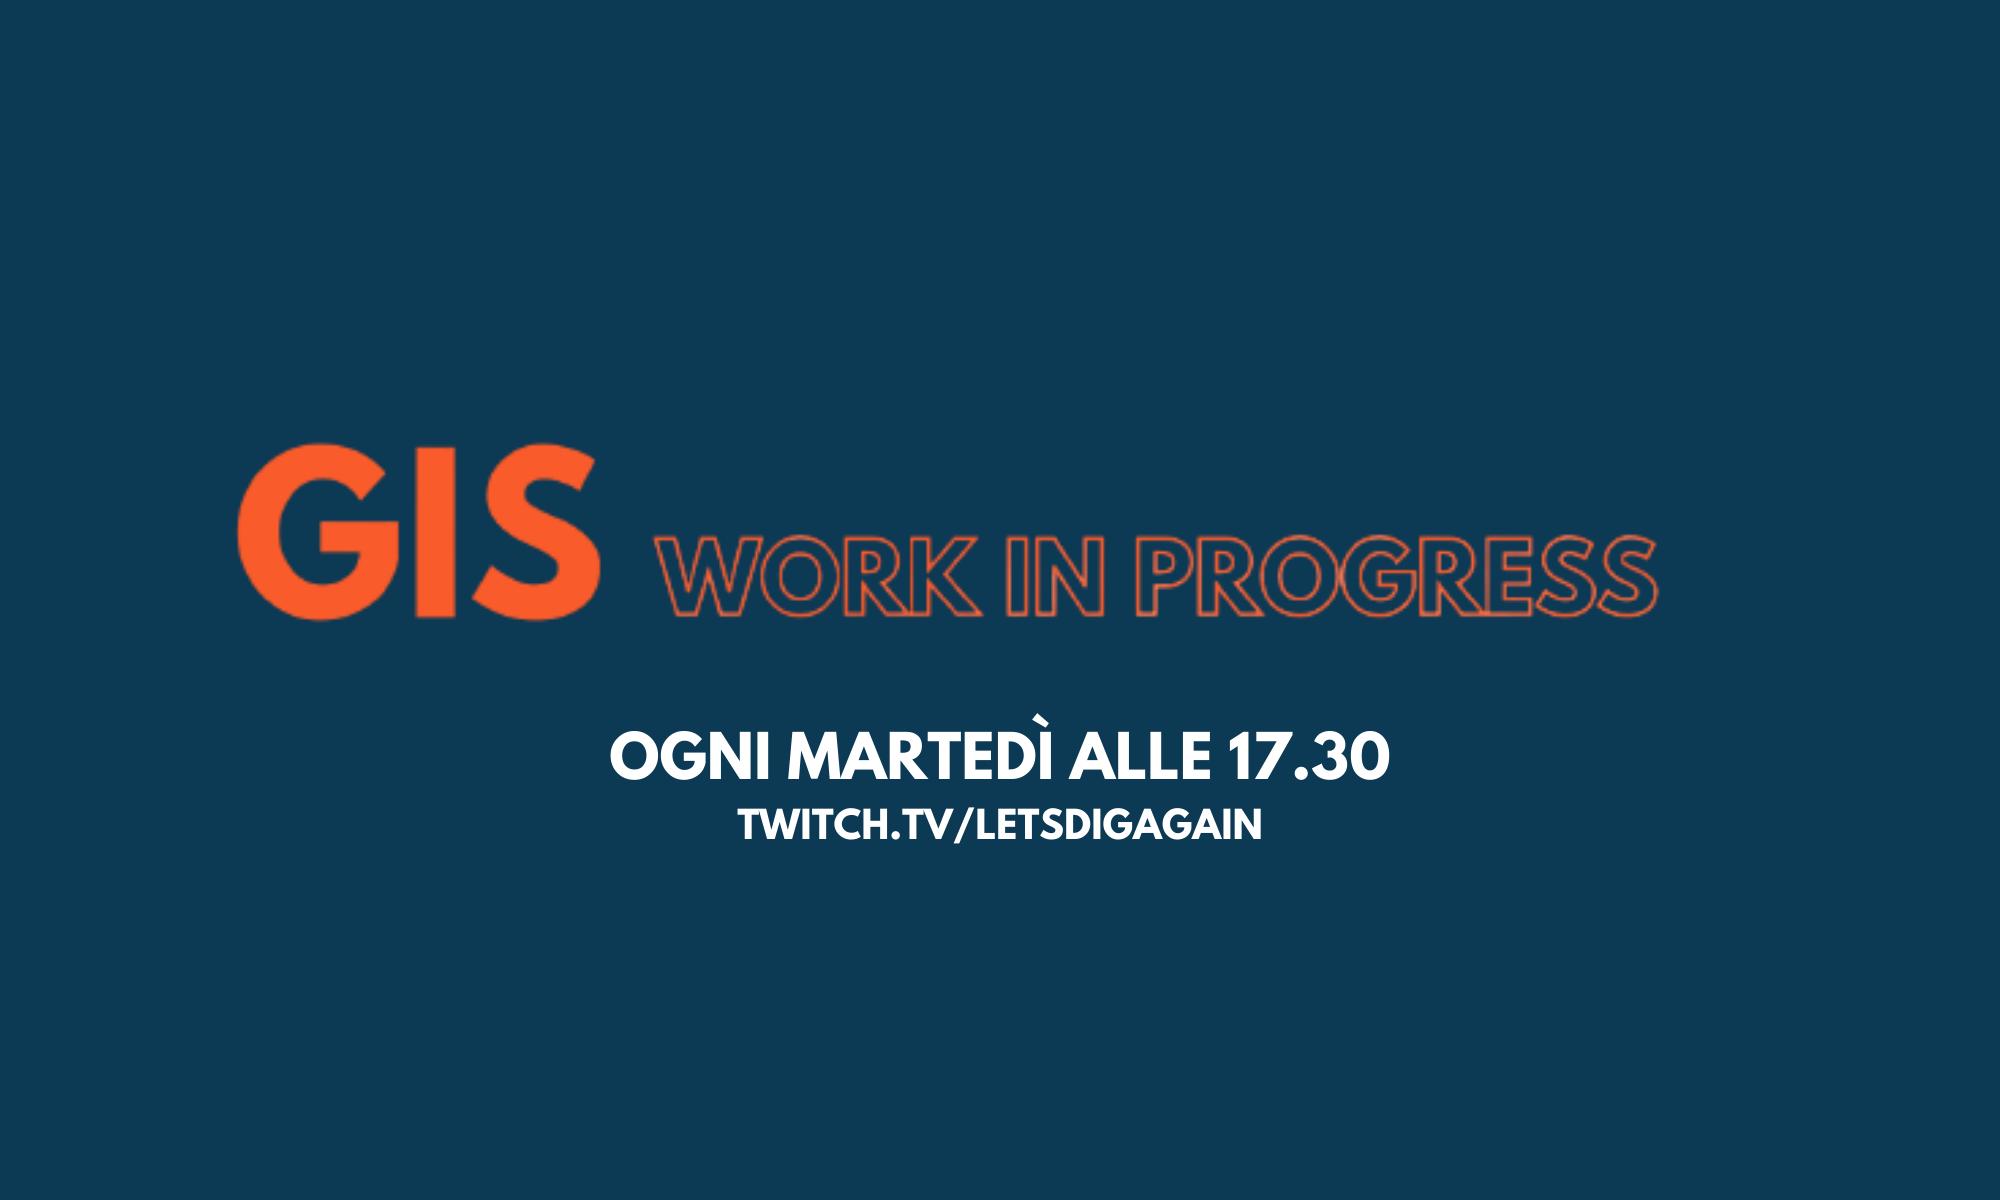 GIS work in progress